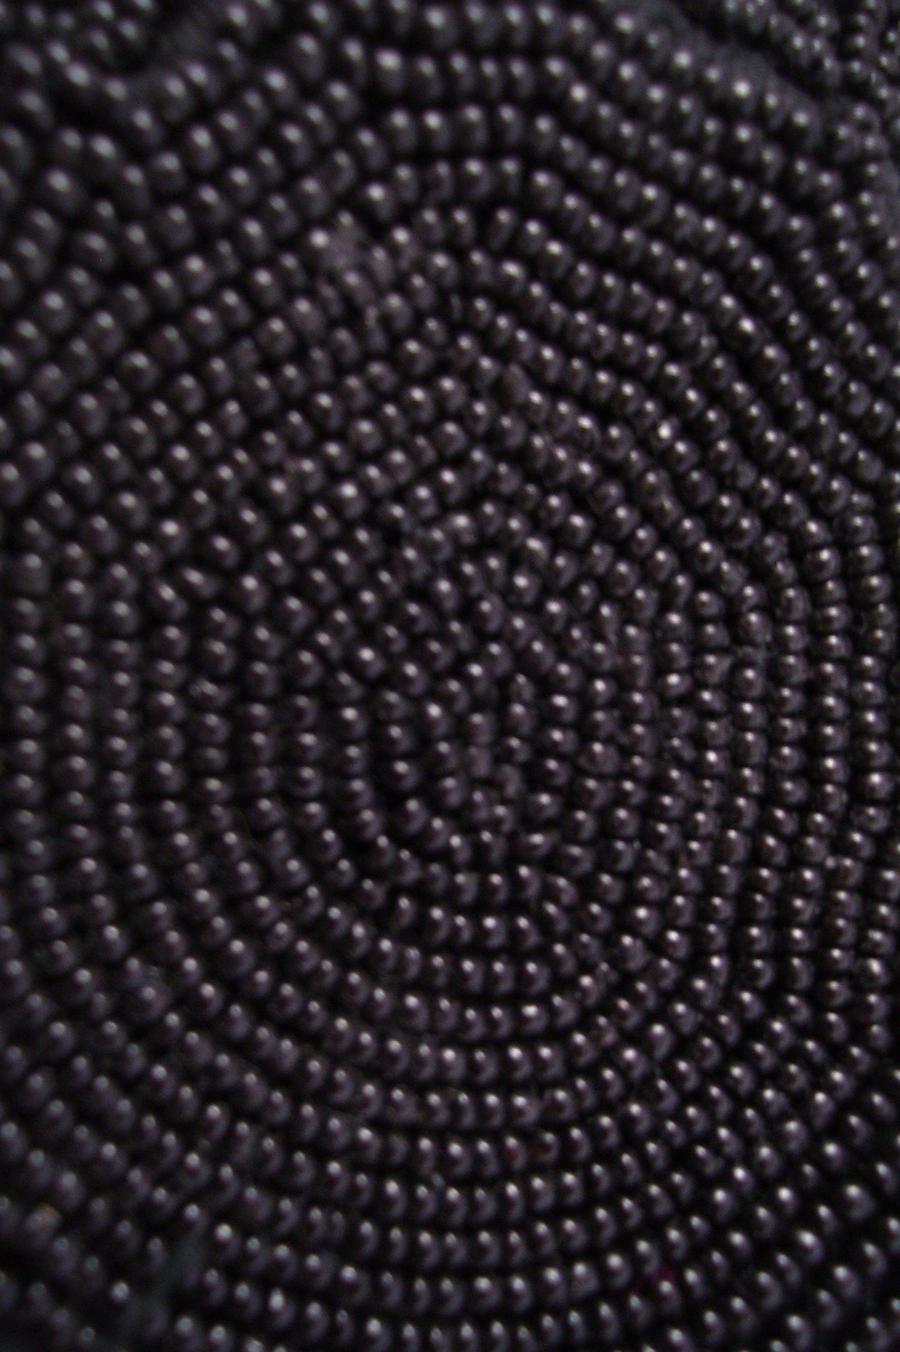 Black Bead Texture